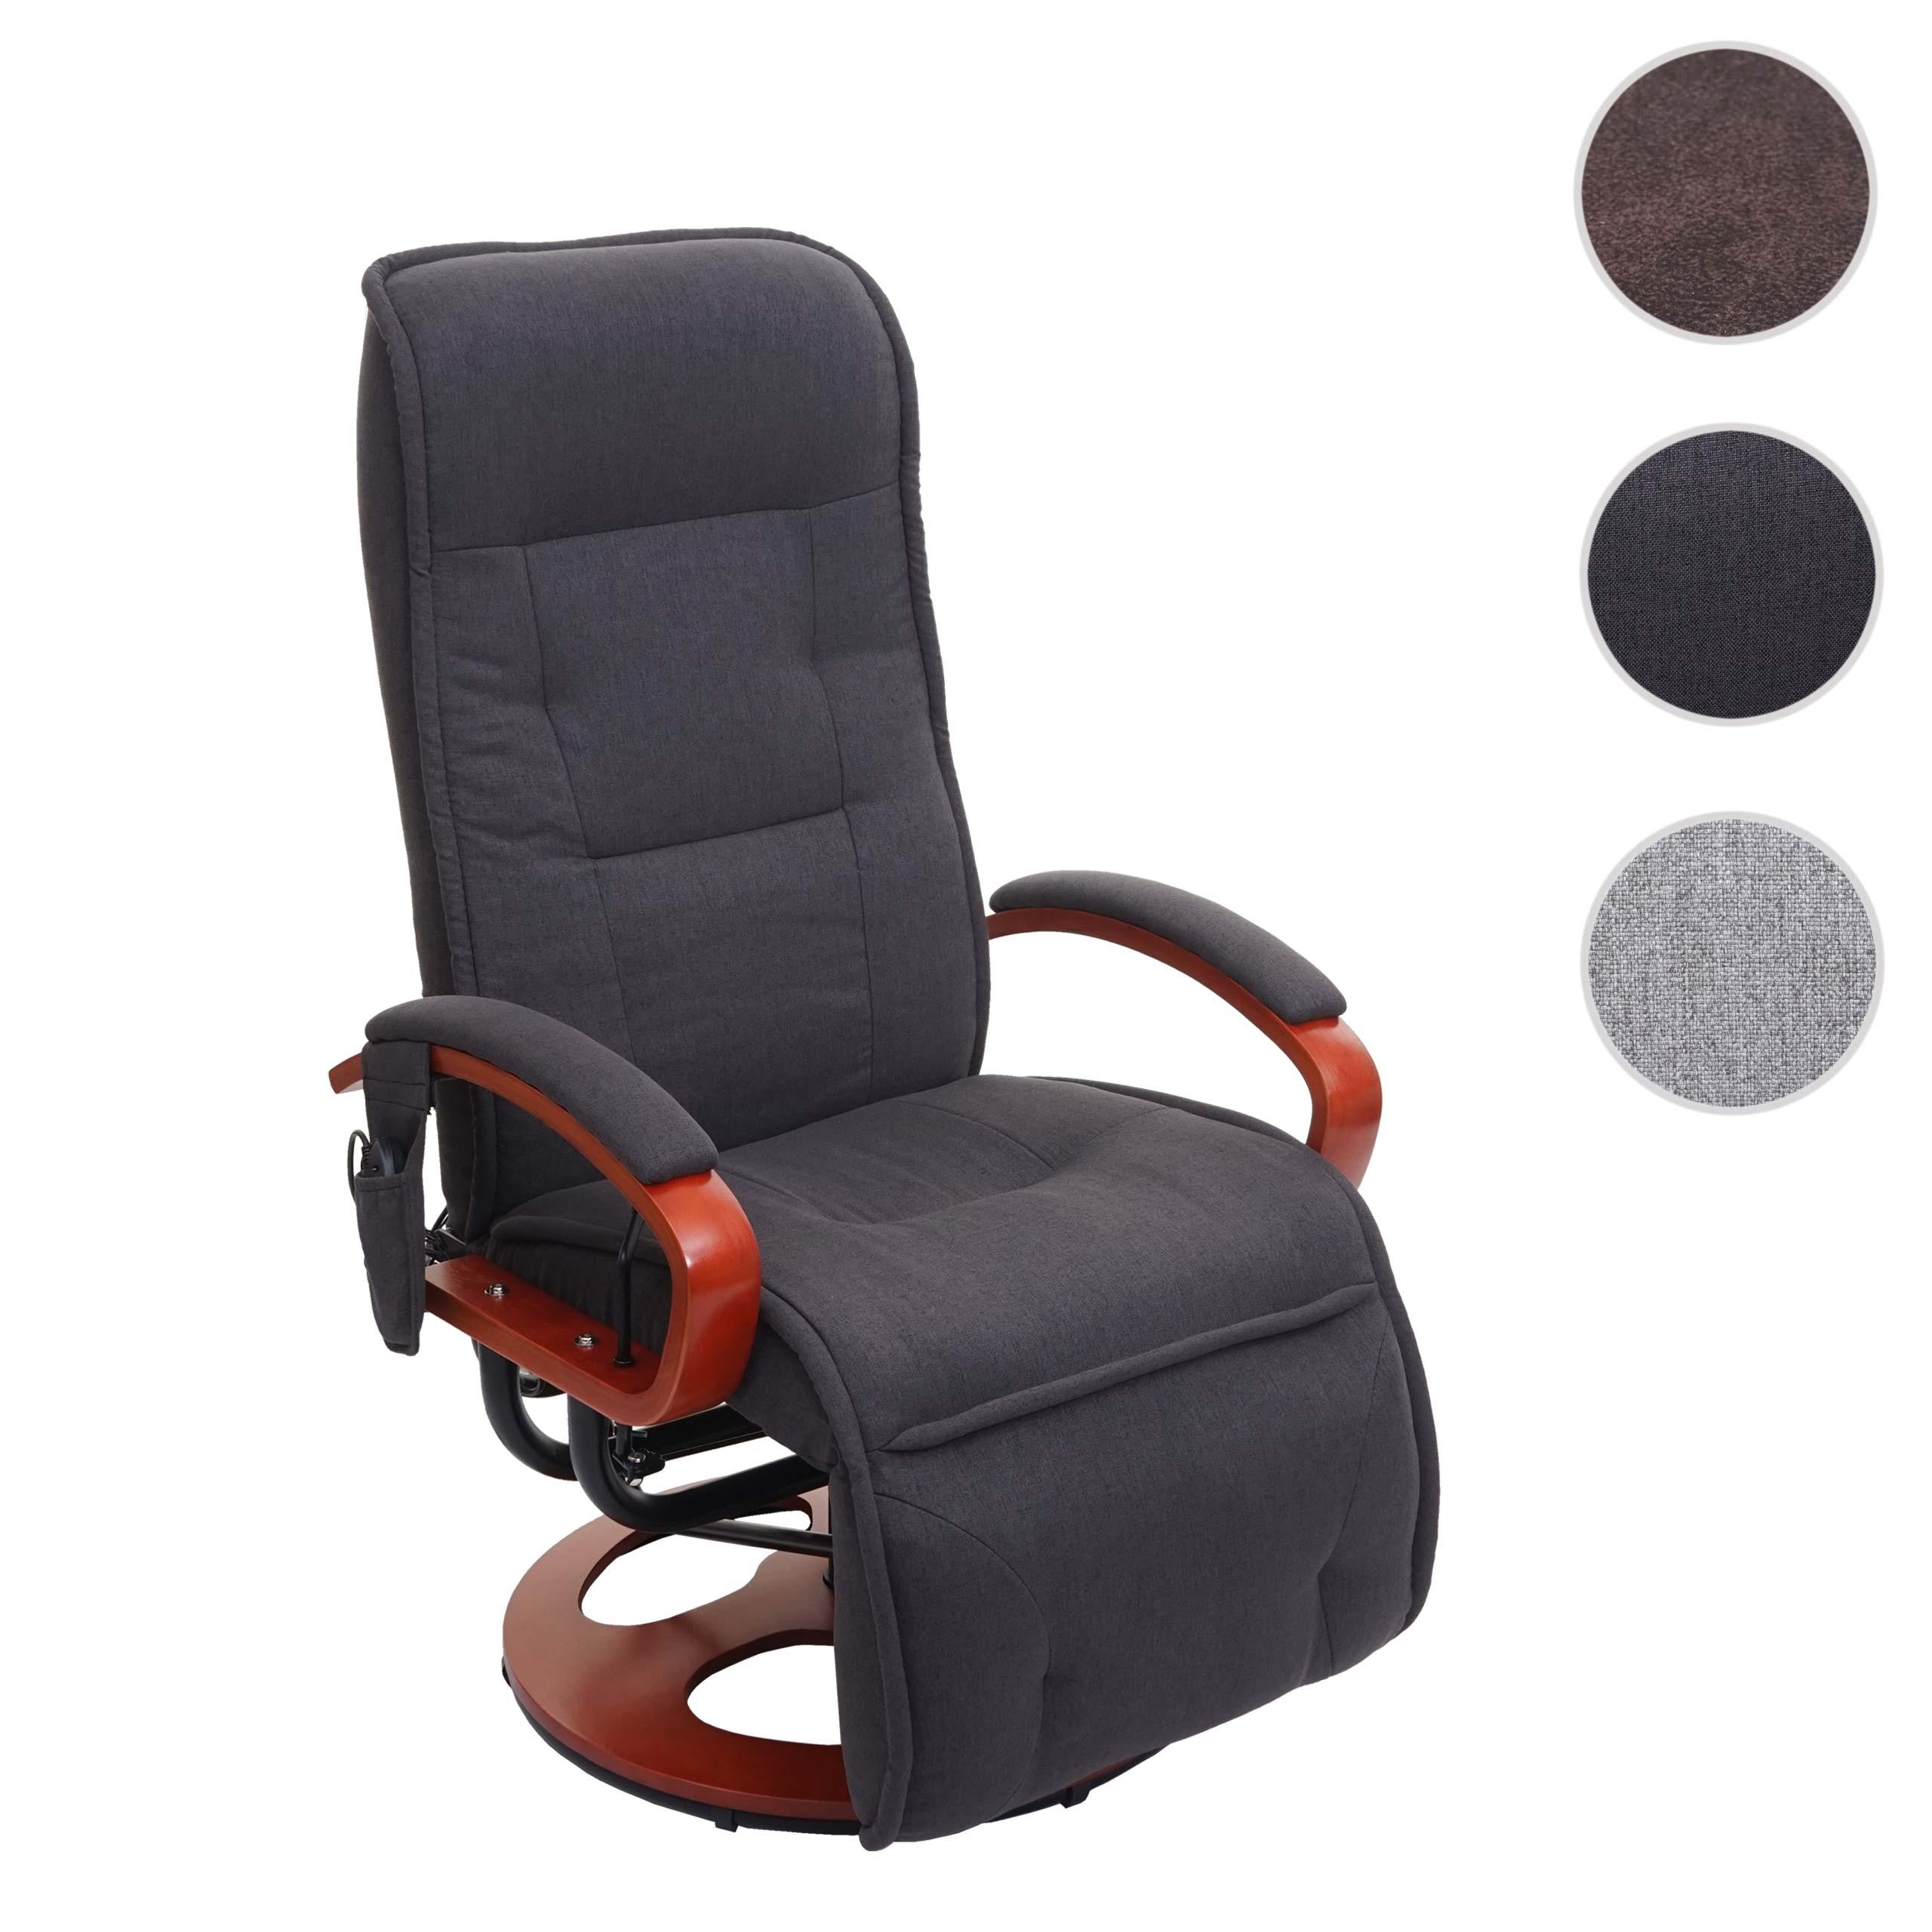 Mendler Relaxliege ARLES II, Relaxsessel Massagesessel, MIT Massage Stoff/Textil ~ Variantenangebot 74170